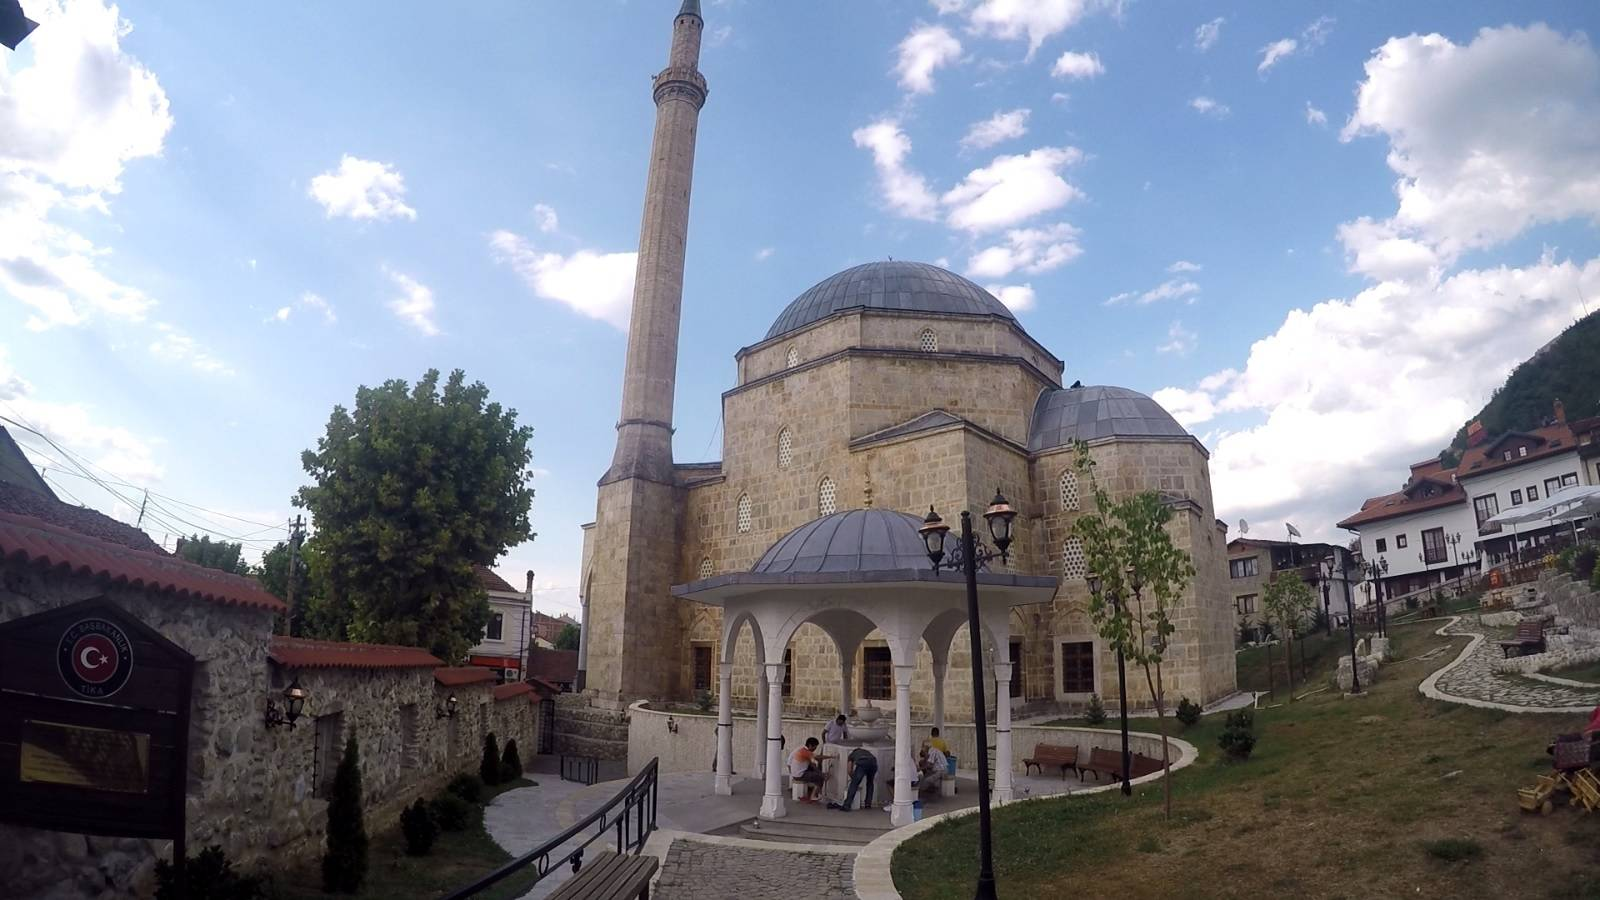 Photo 1: Prizren, petite ville accueillante du Kosovo